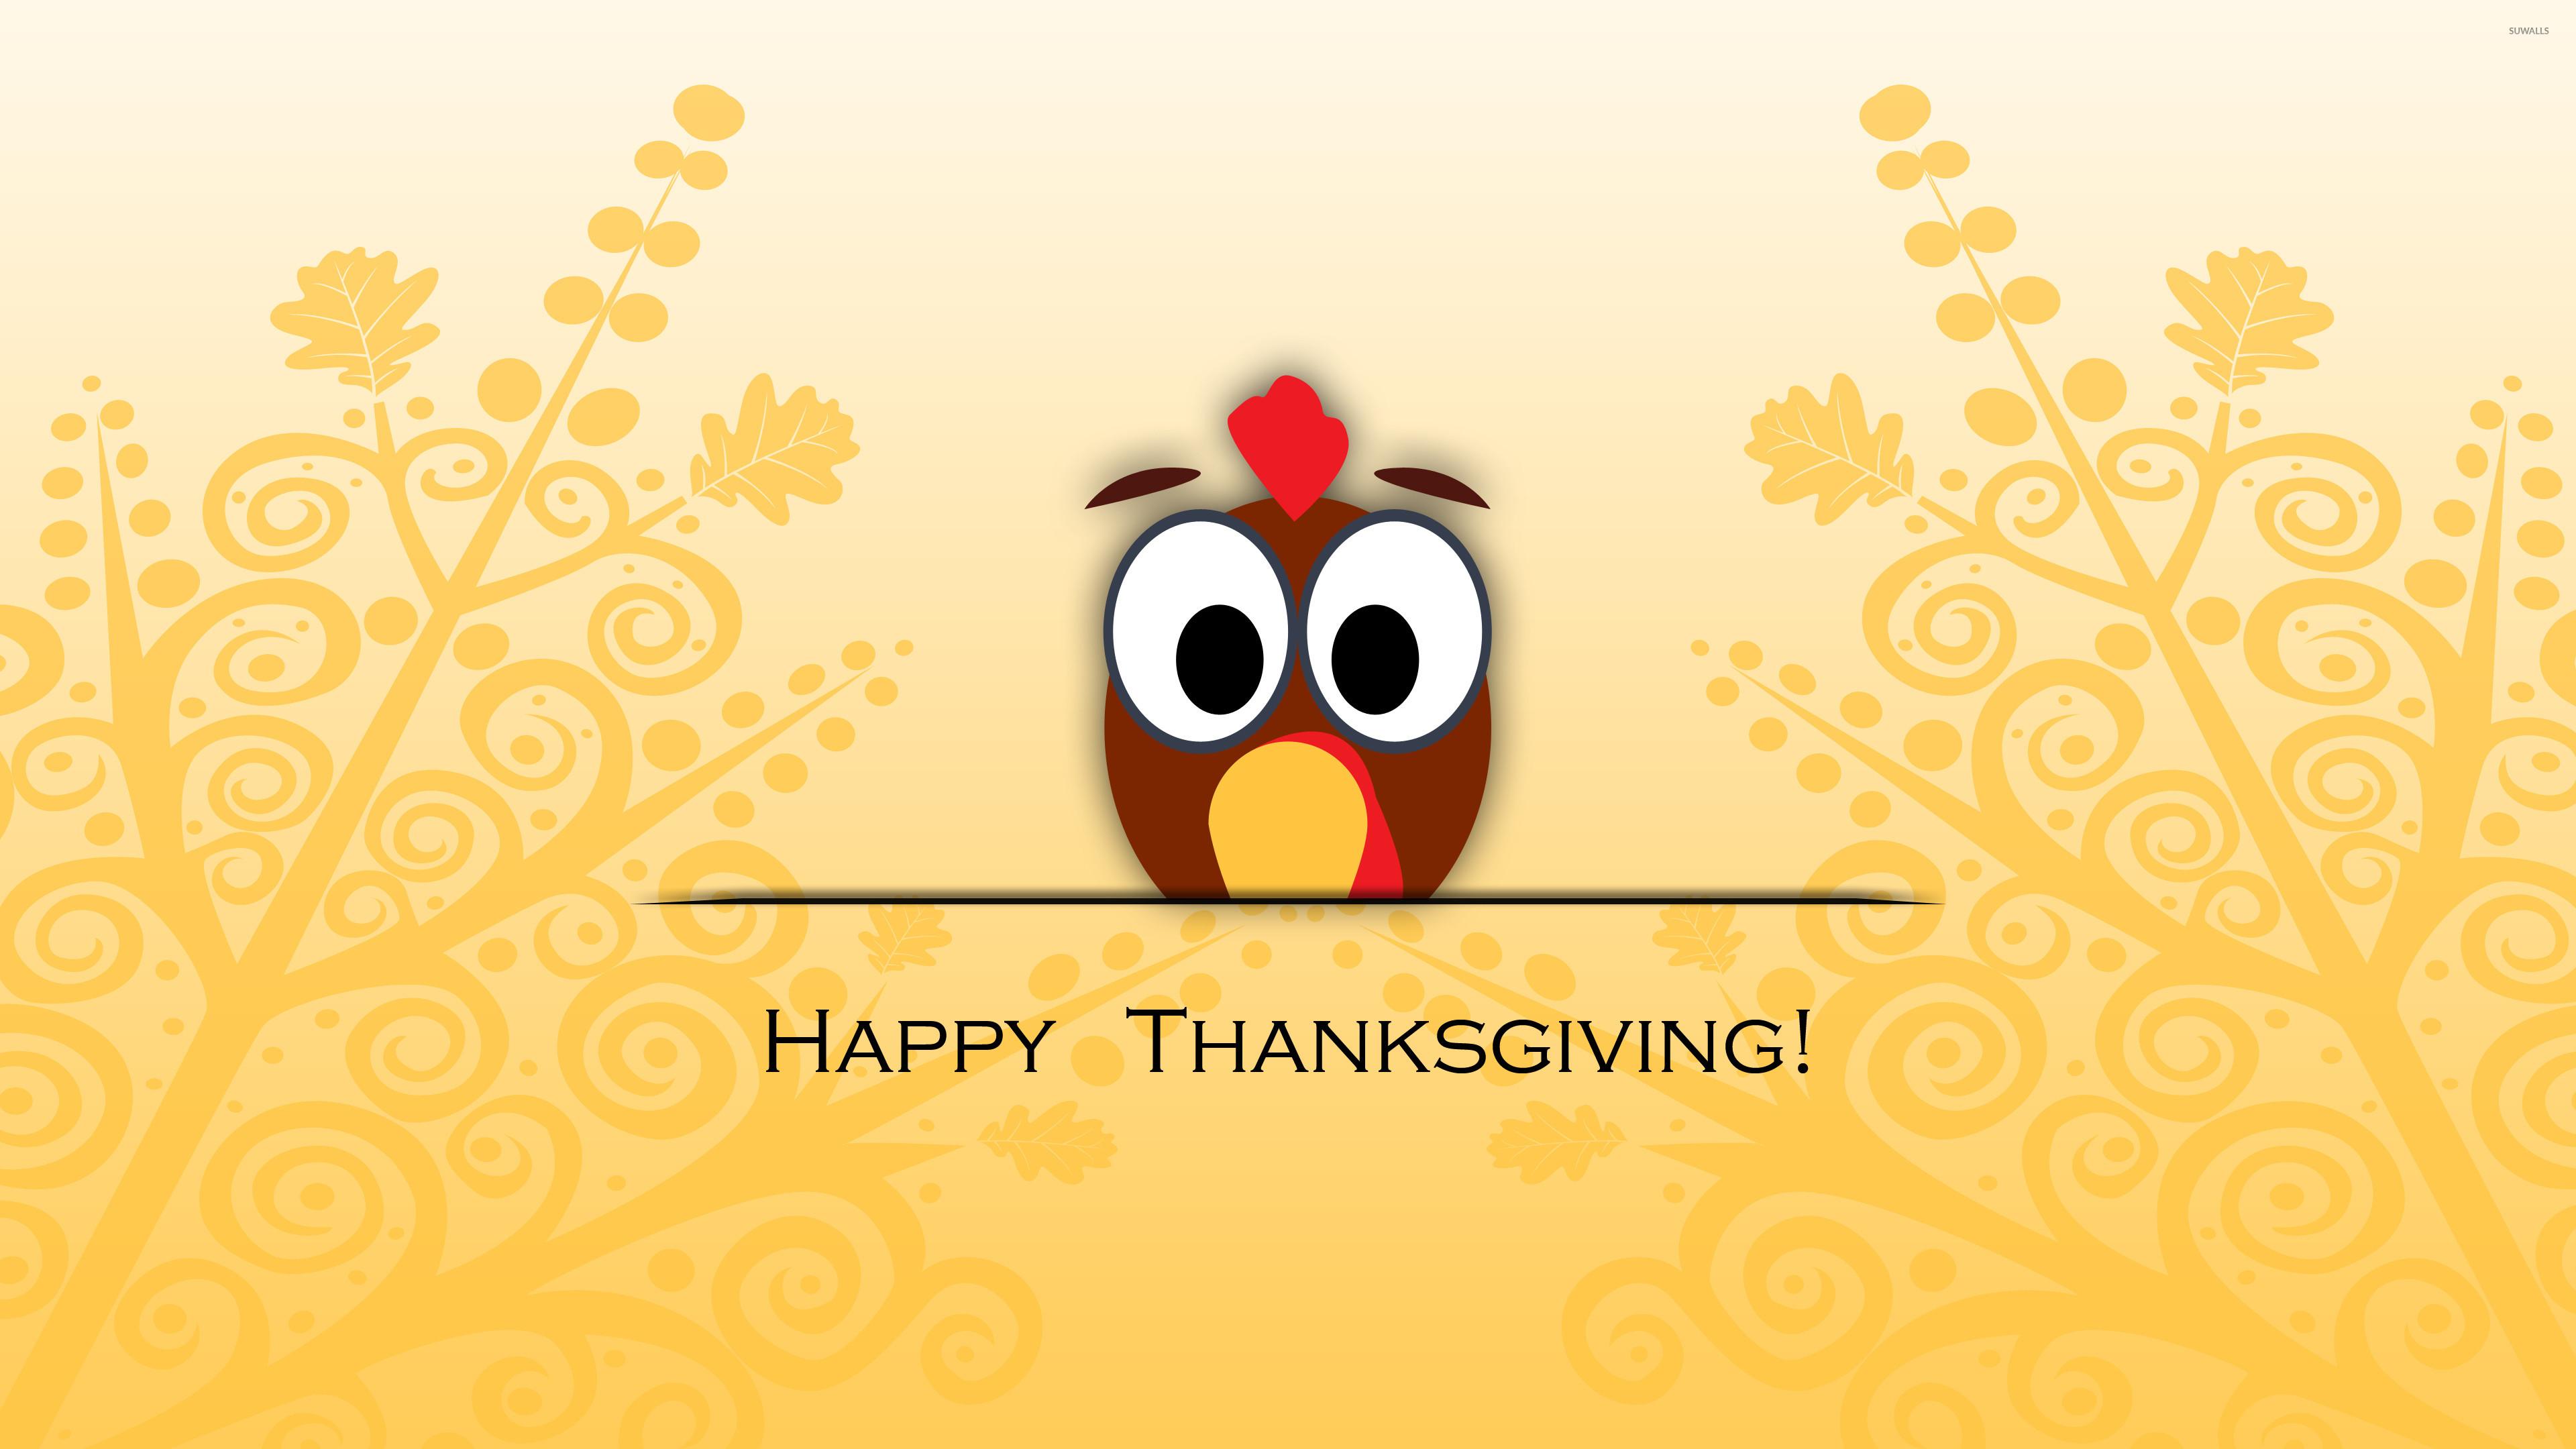 1920x1080 Happy Thanksgiving Wallpaper HD